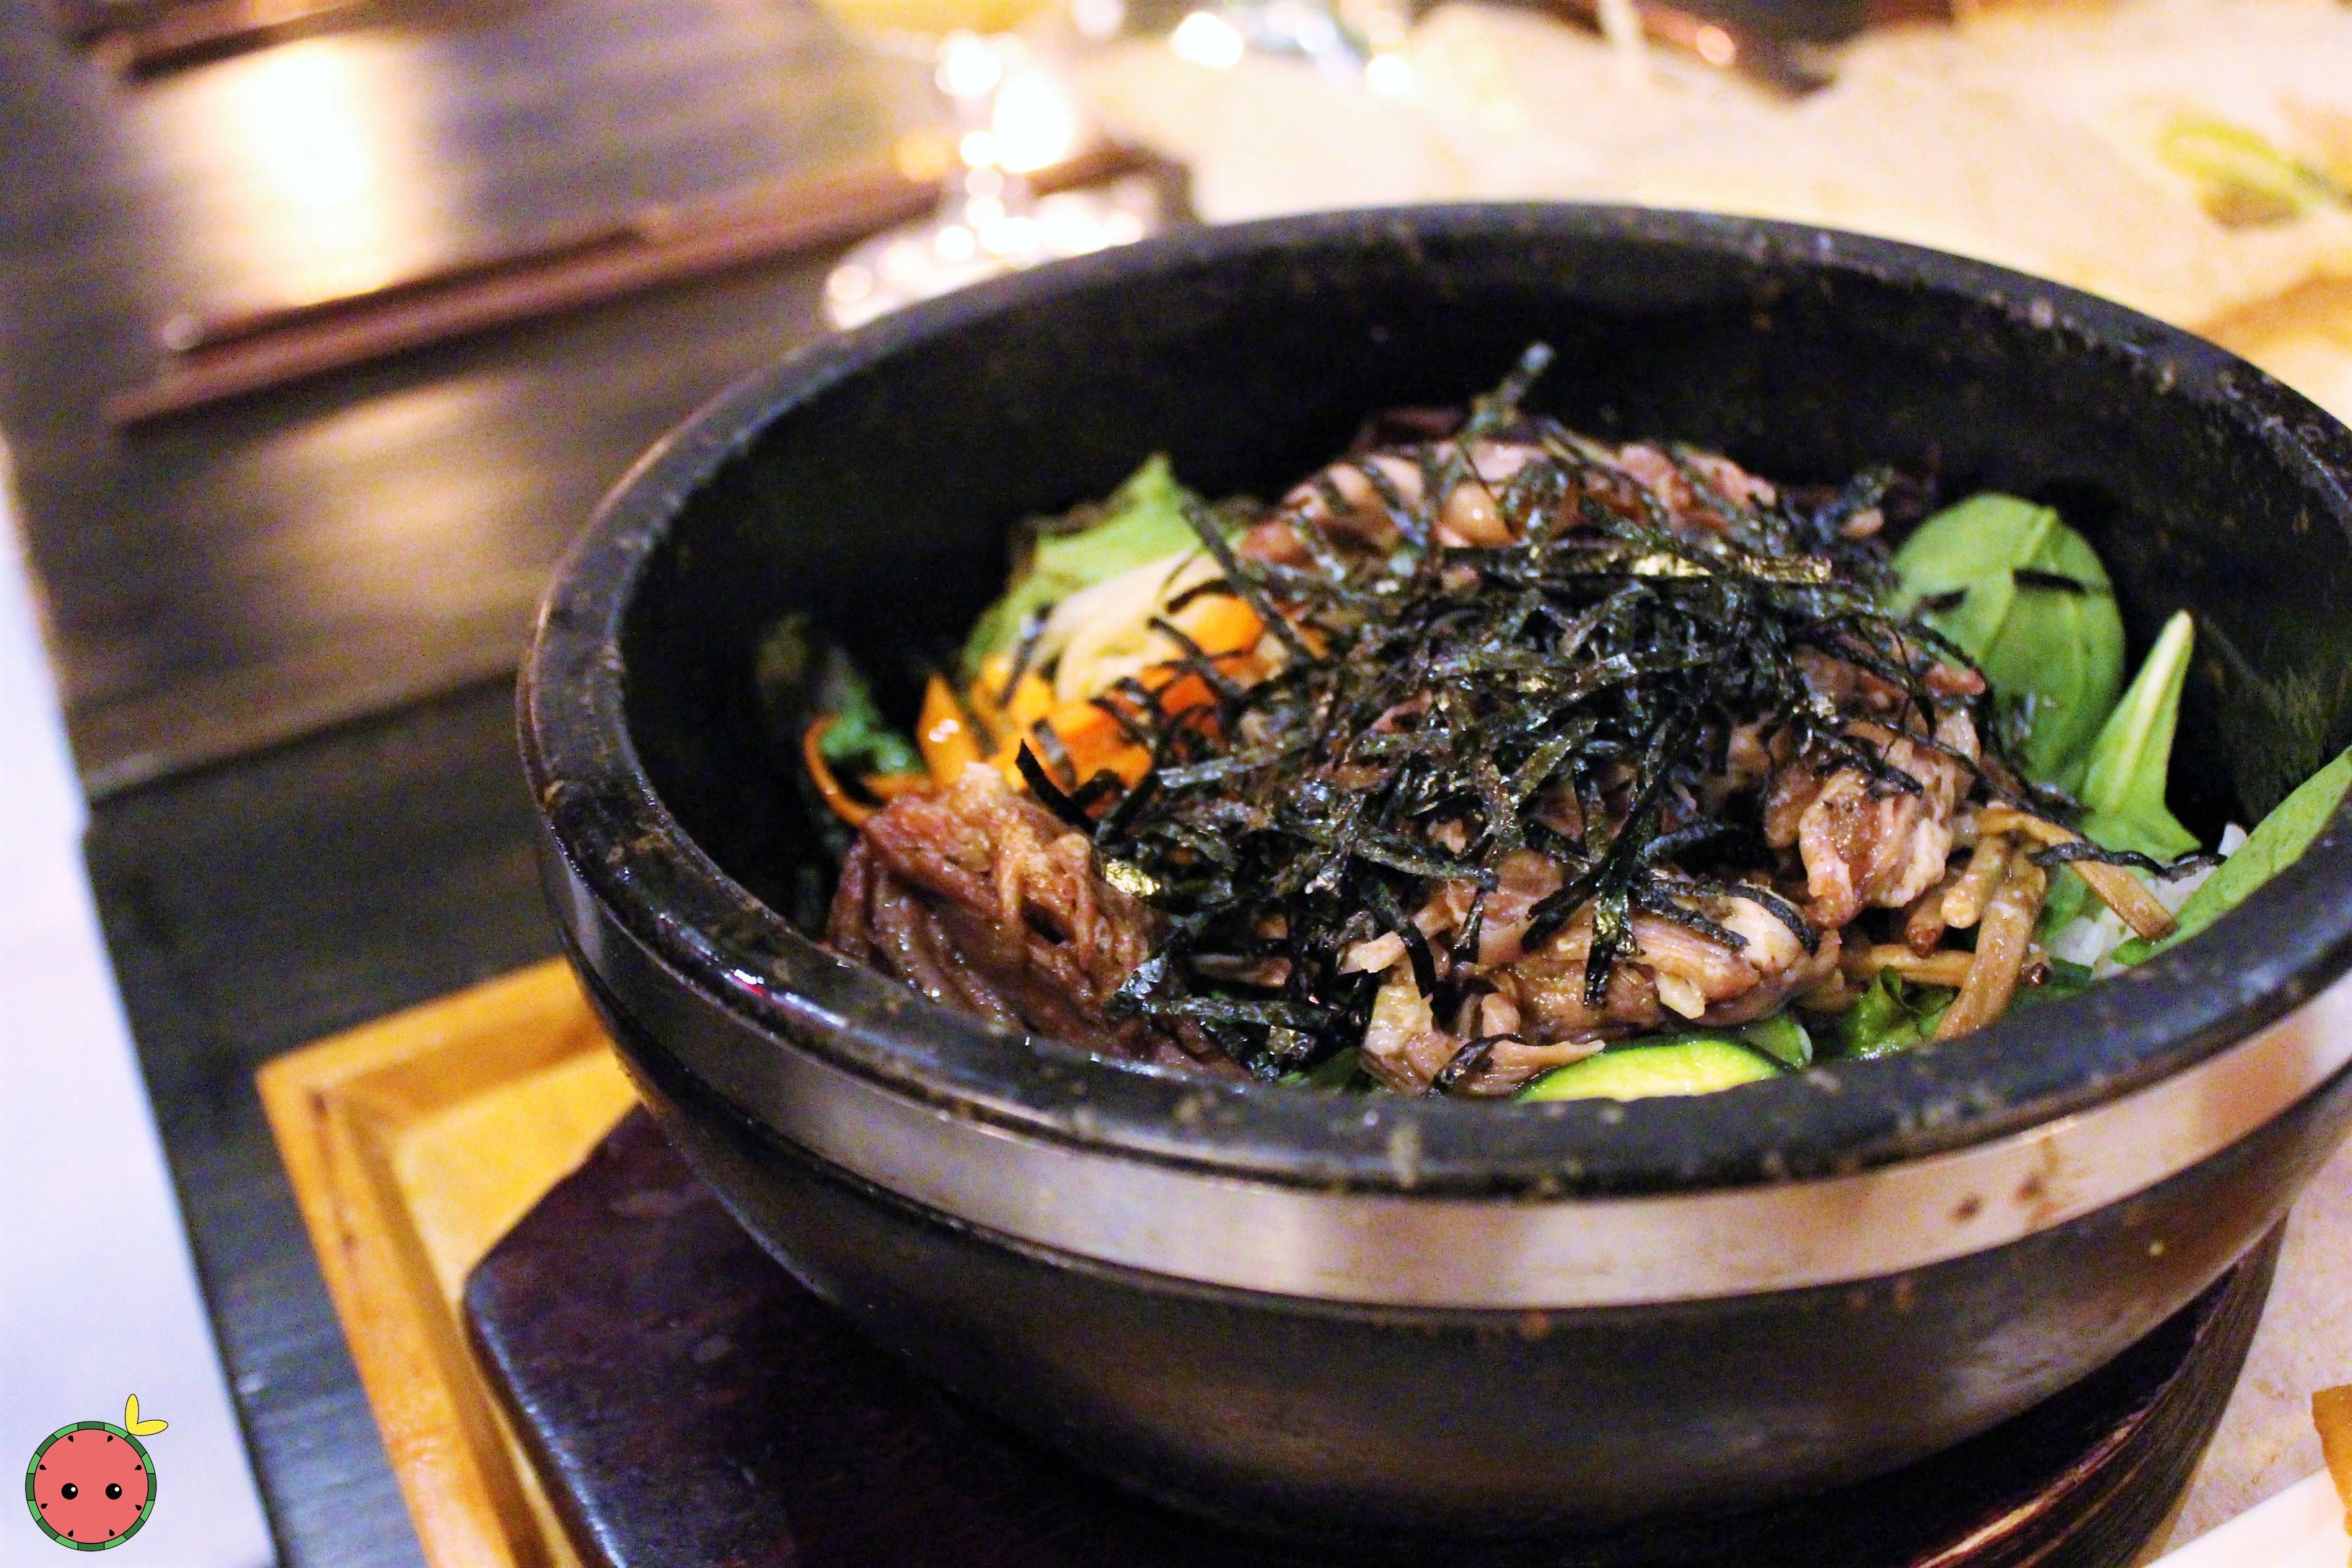 Duck Bibimbap - Rice, shredded duck meat, chili pepper paste